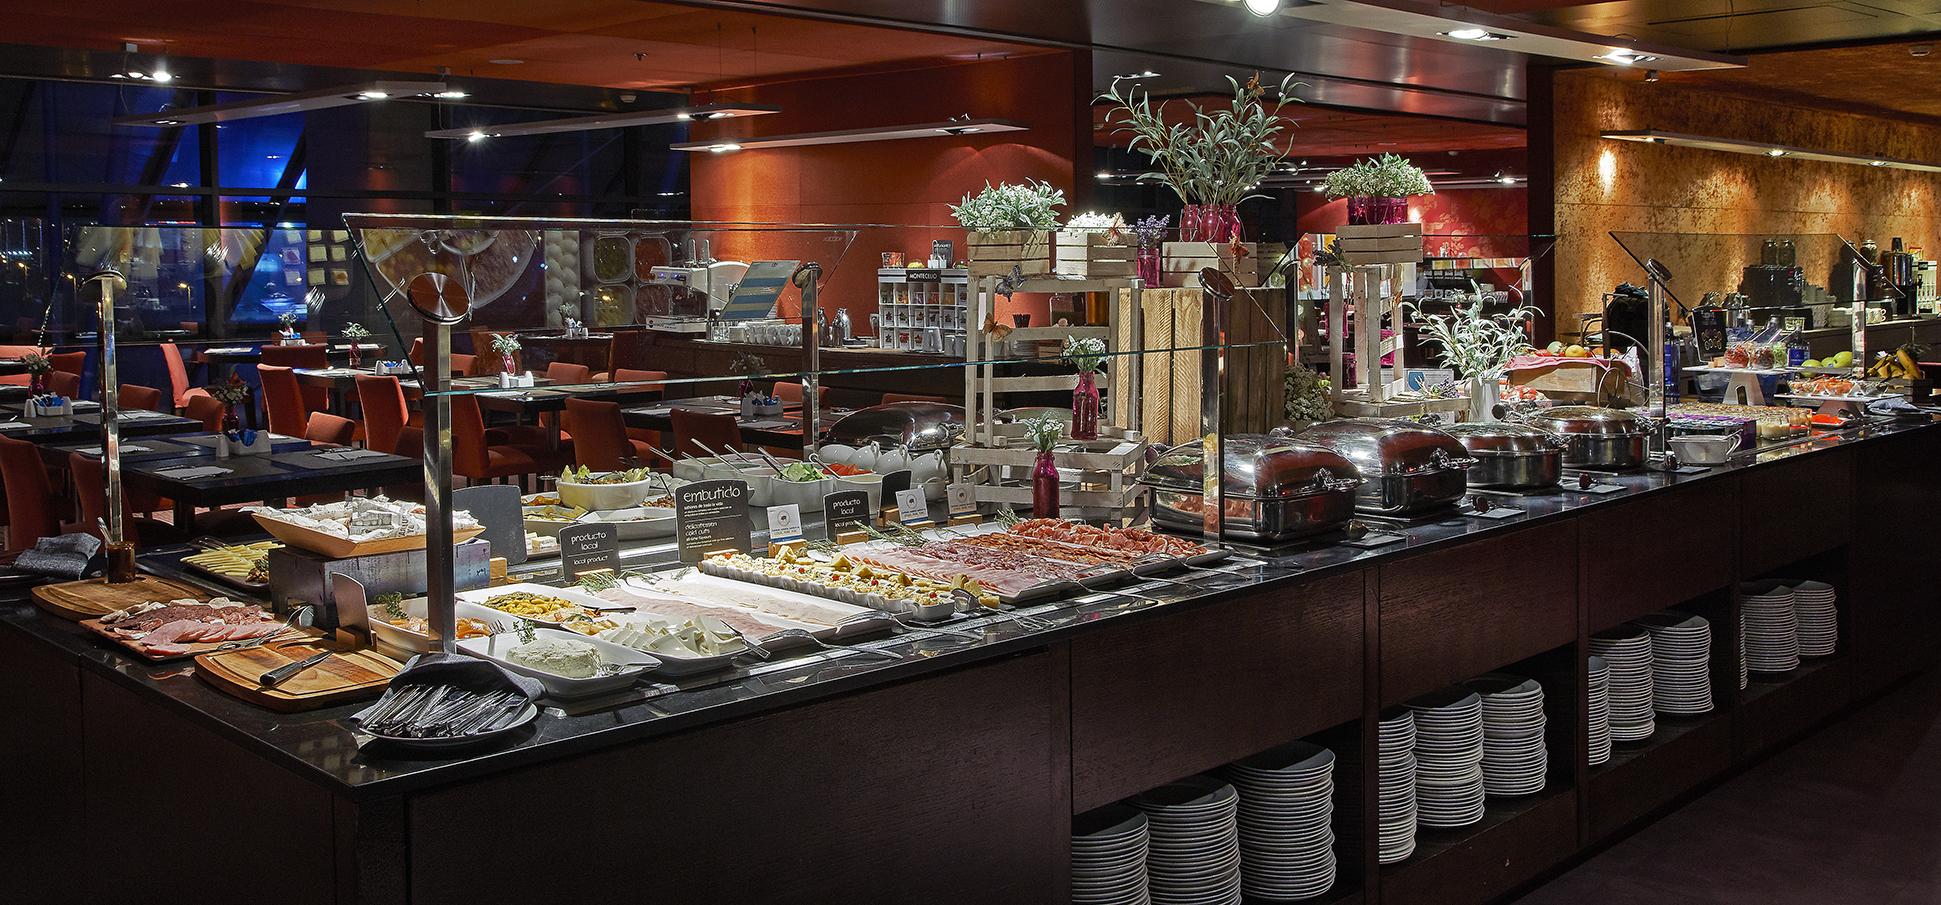 Breakfast at the Hotel Hesperia Tower Barcelona